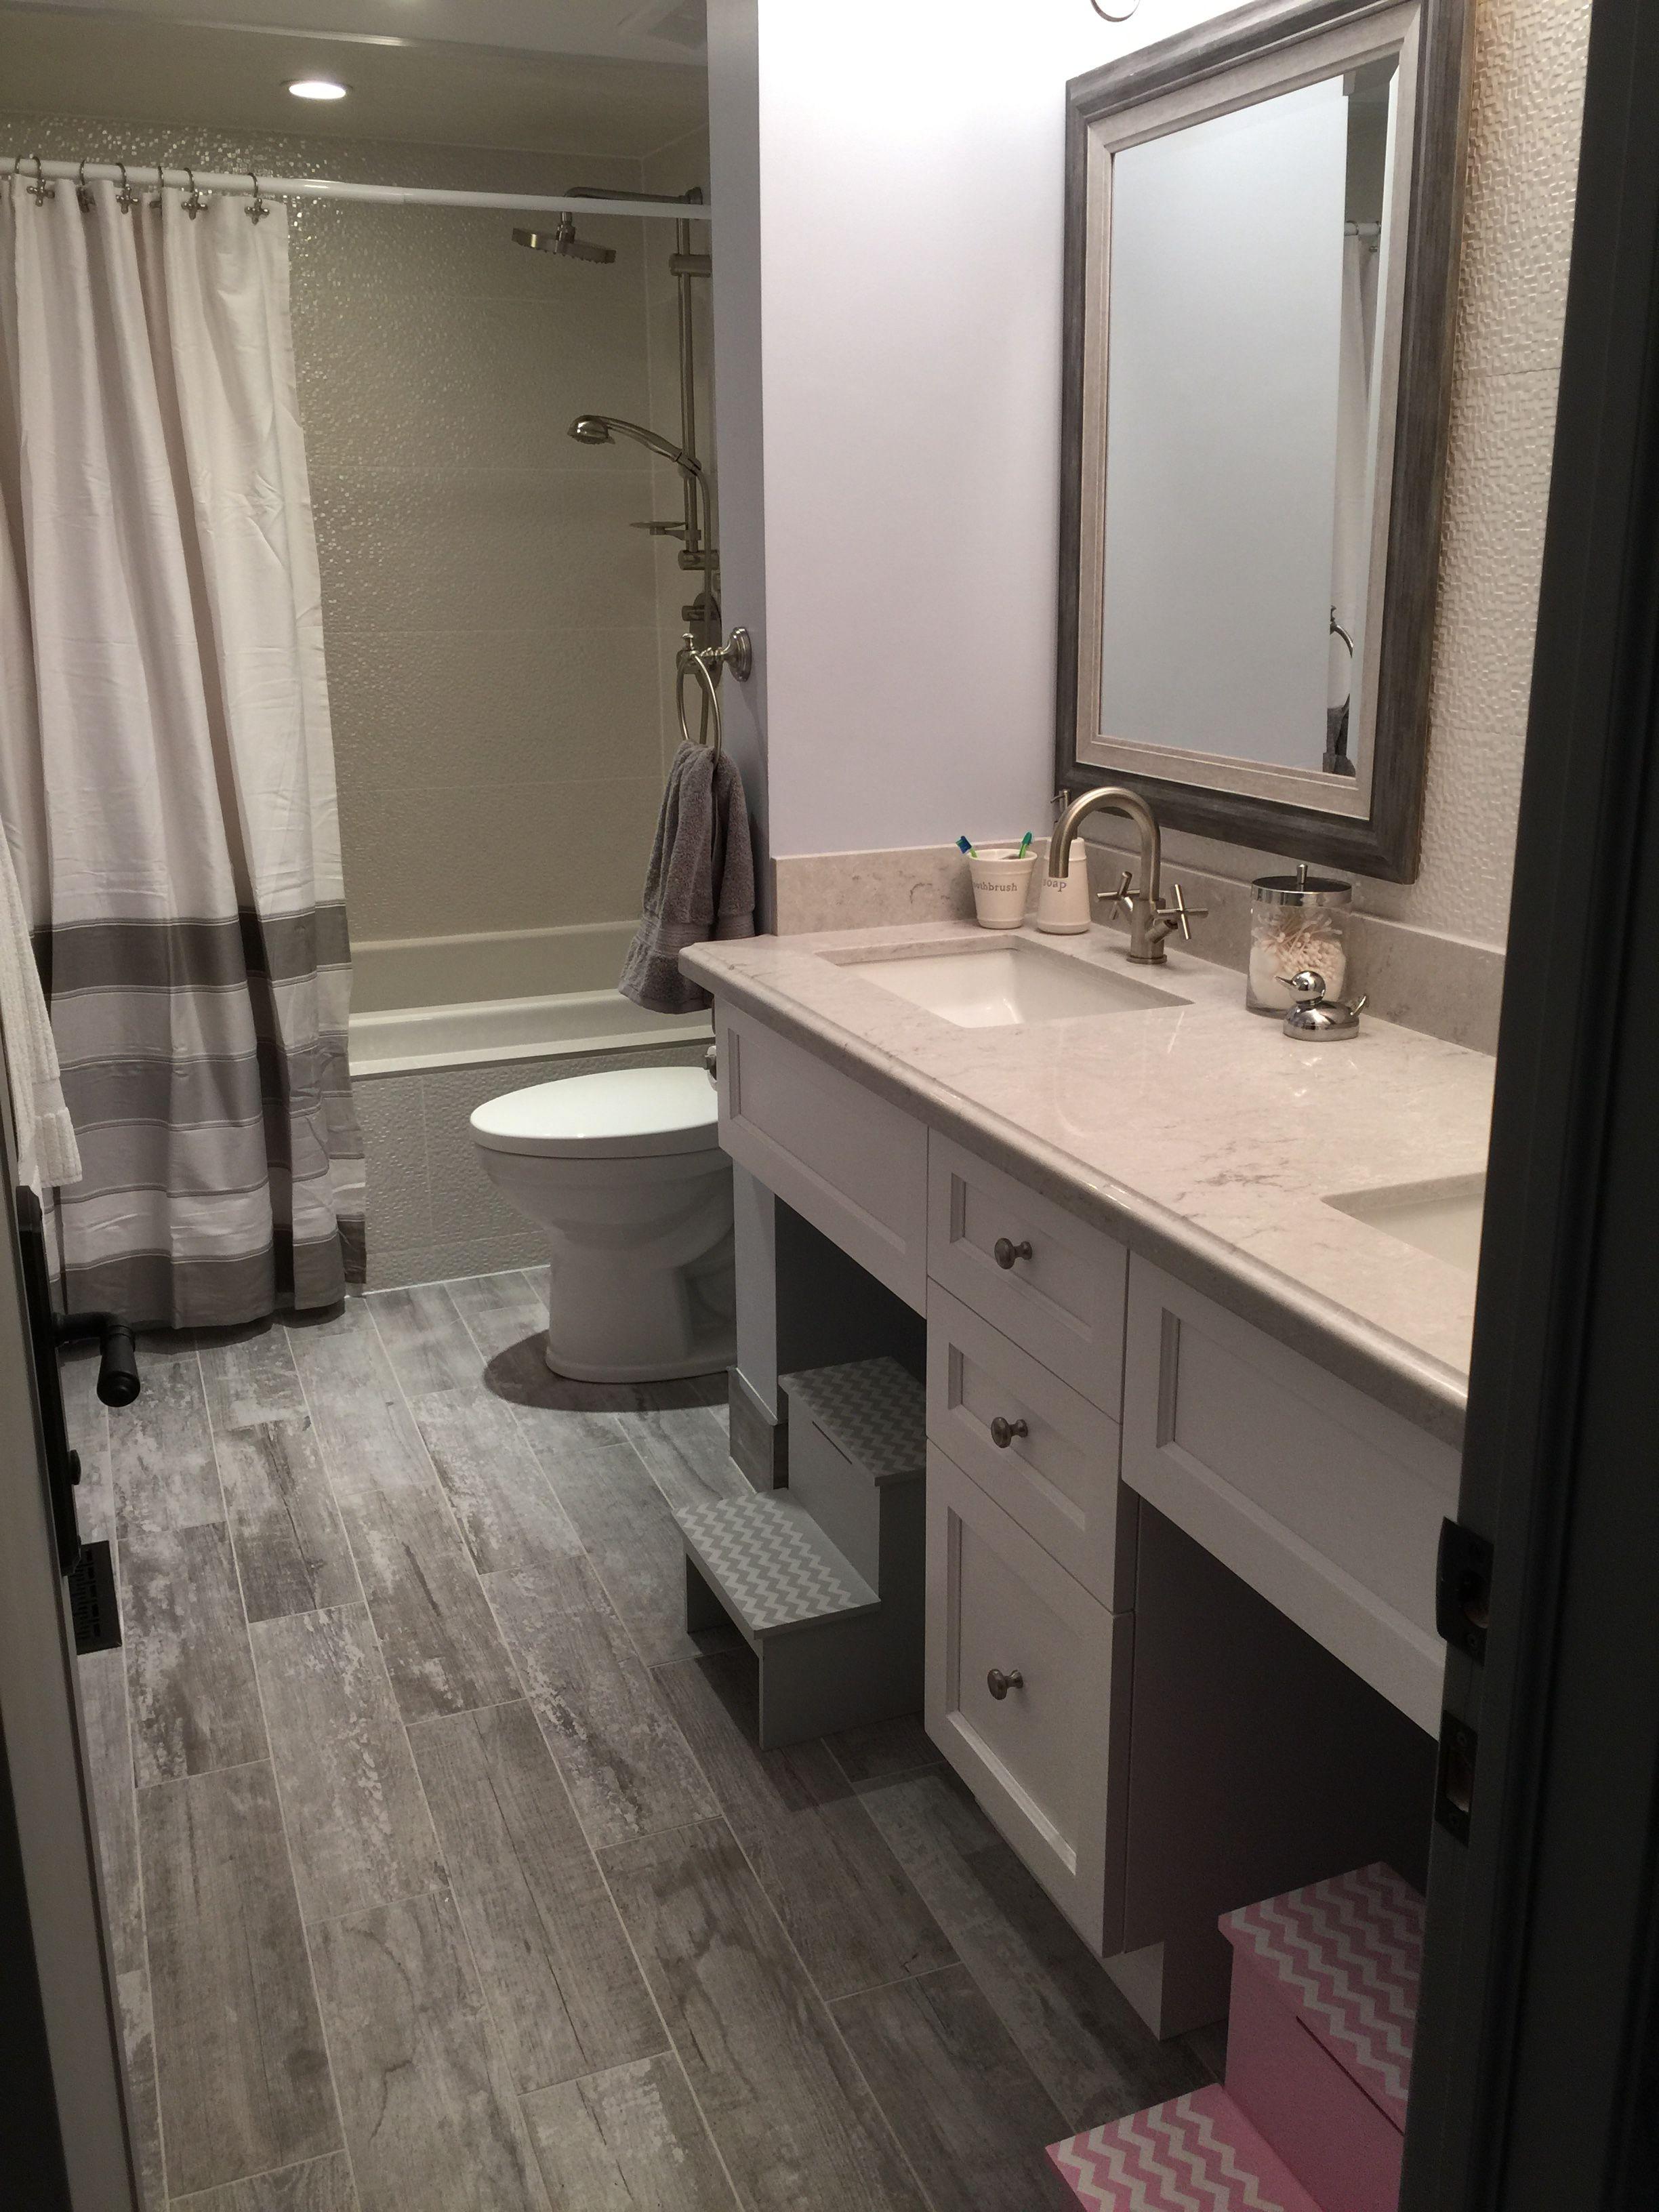 Floor tile stonepeak crate weathered board 6 x24 for Porcelanosa bathroom floor tiles